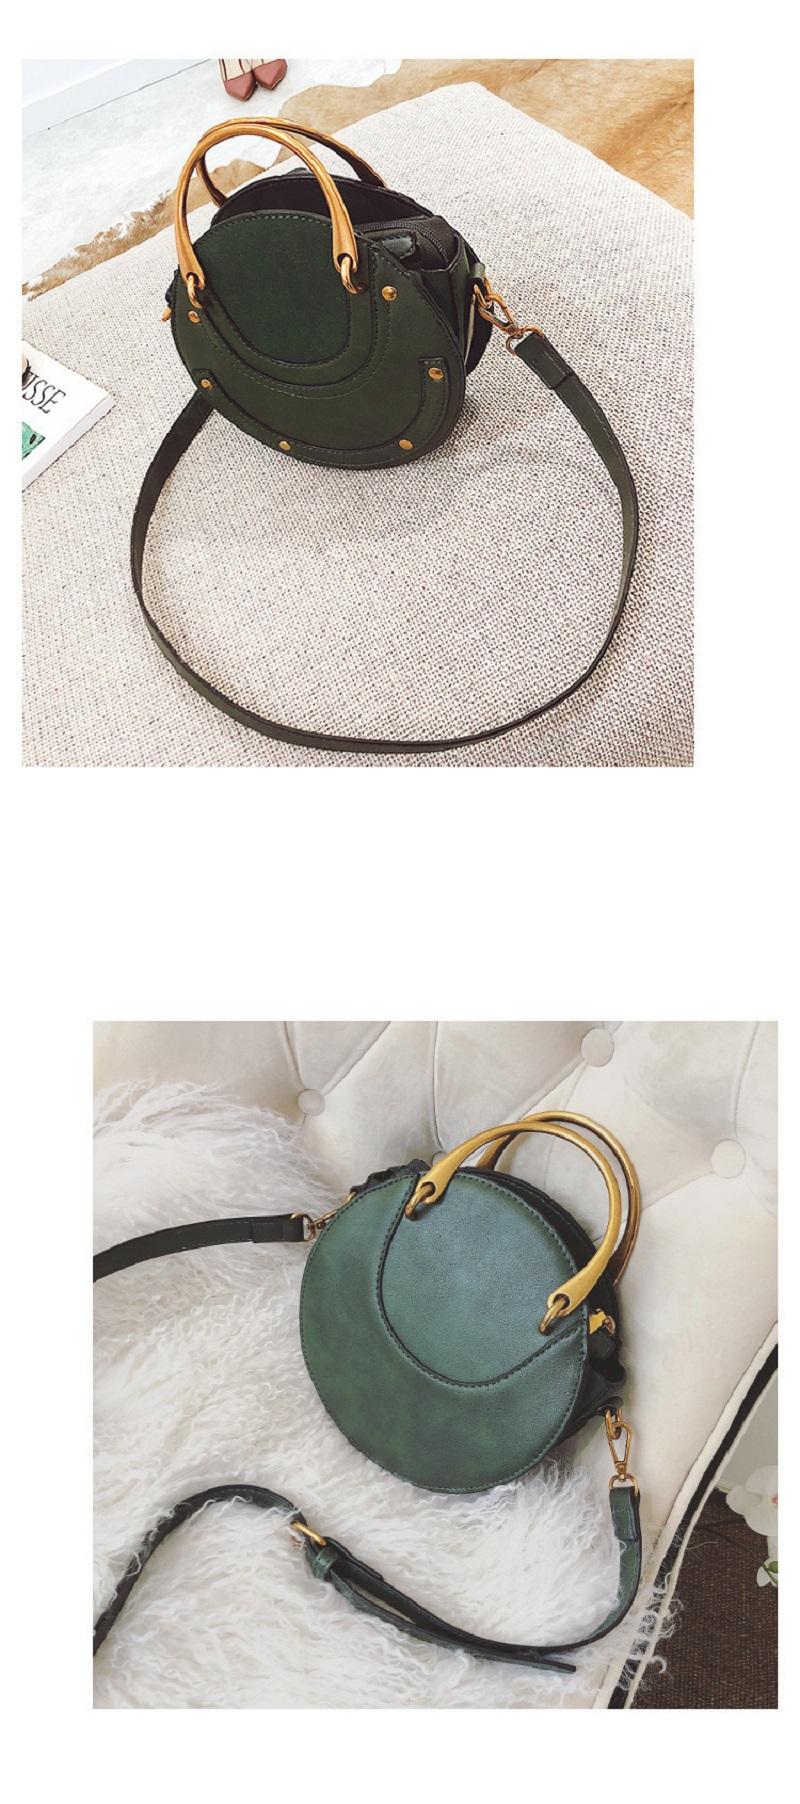 Circle Bag Crossbody Shoulder Bag, Elegant, fashionable yet practical handbag